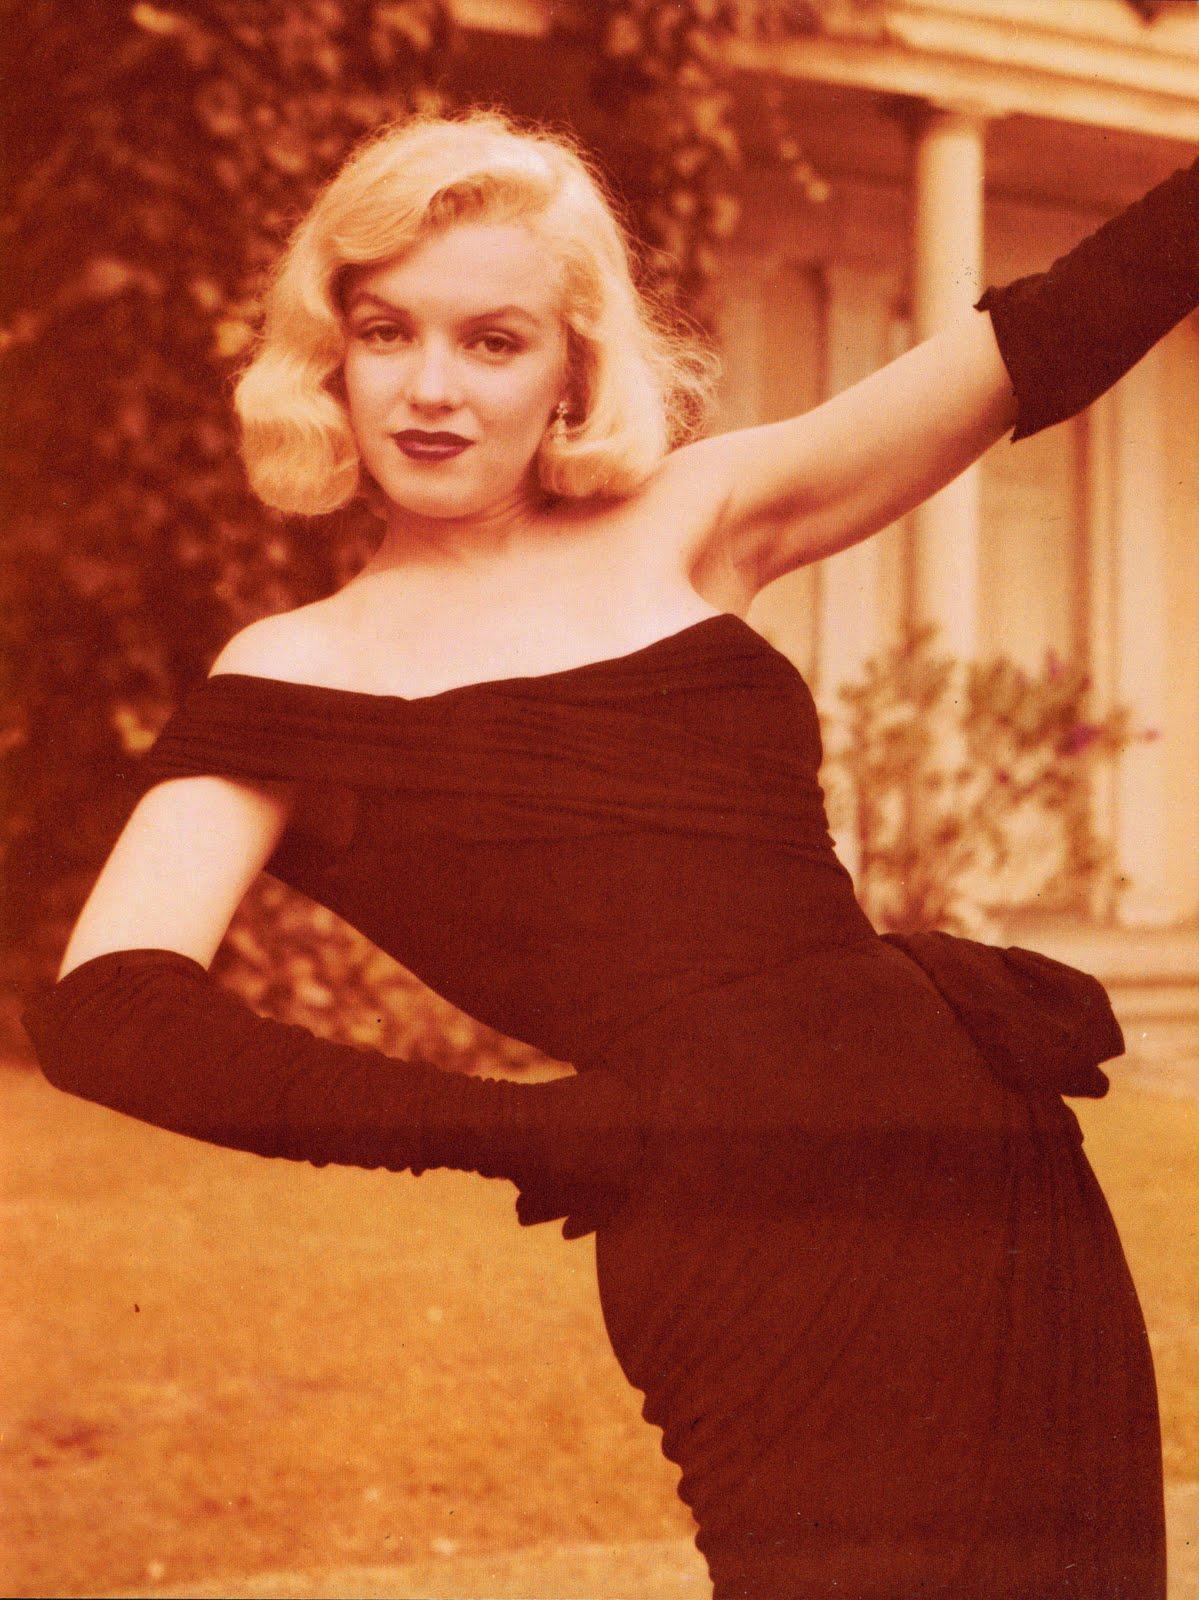 Marilyn Monroe Living Room Decor: WEIRDLAND: Iconic Beauties (Marilyn Monroe, Kirsten Dunst